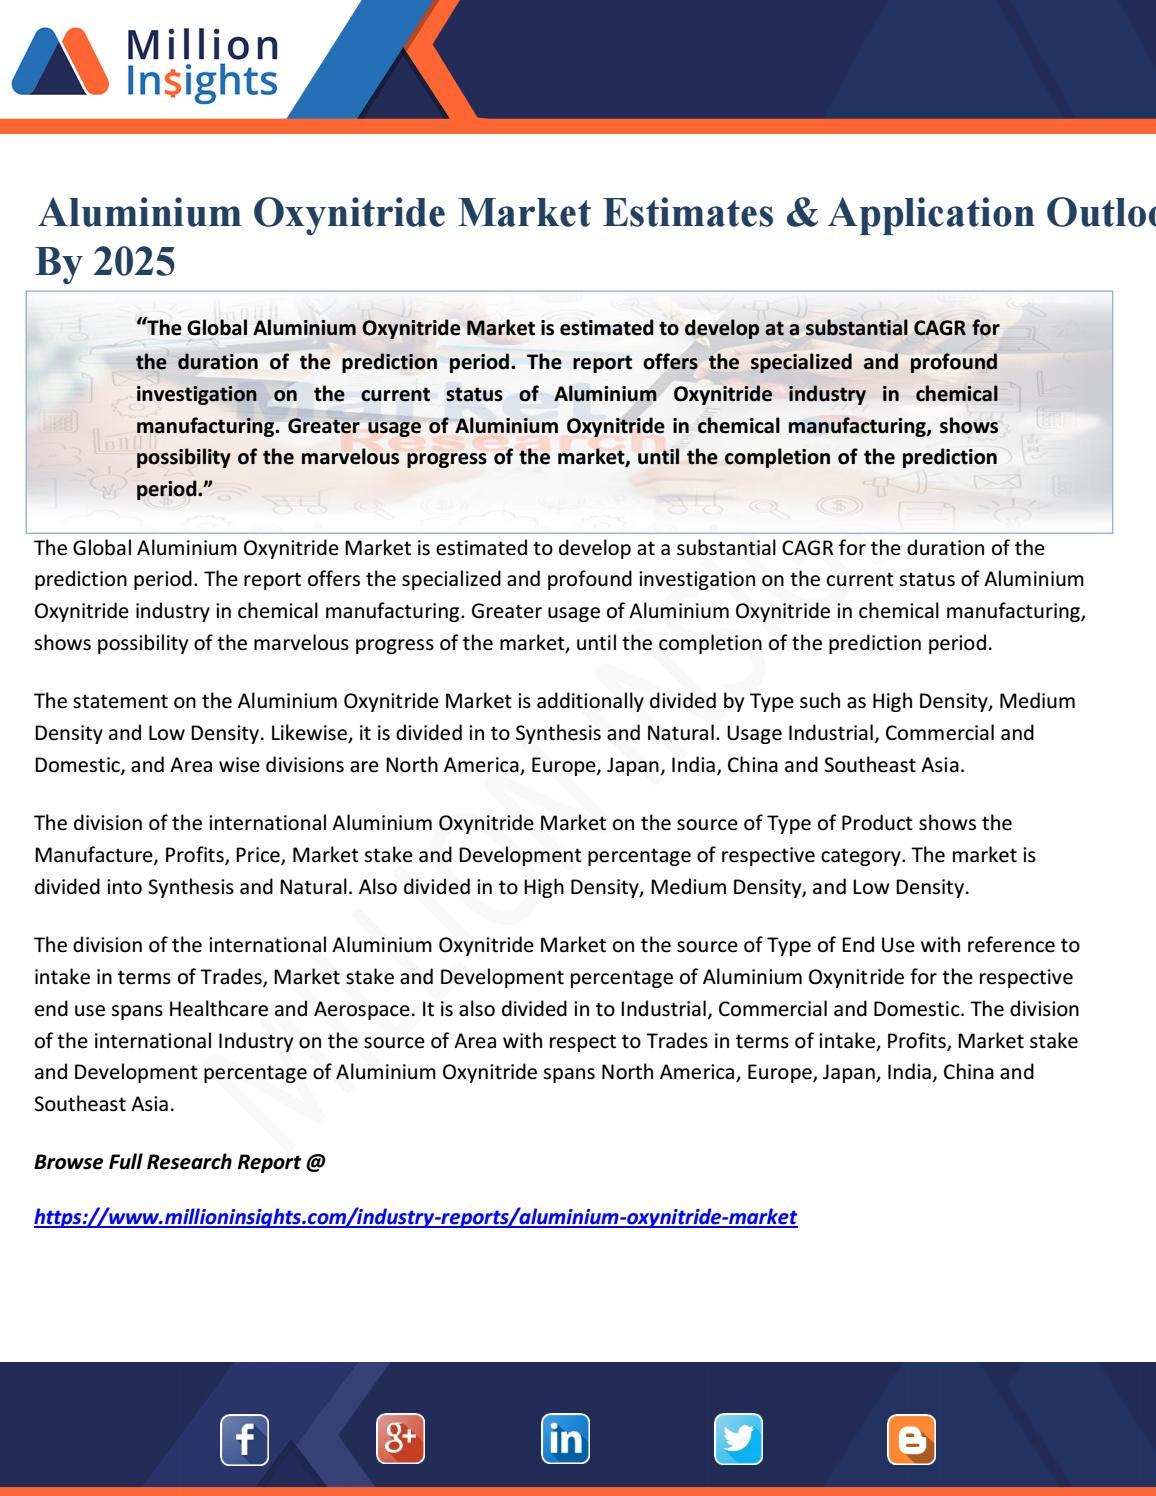 aluminium oxynitride market estimates